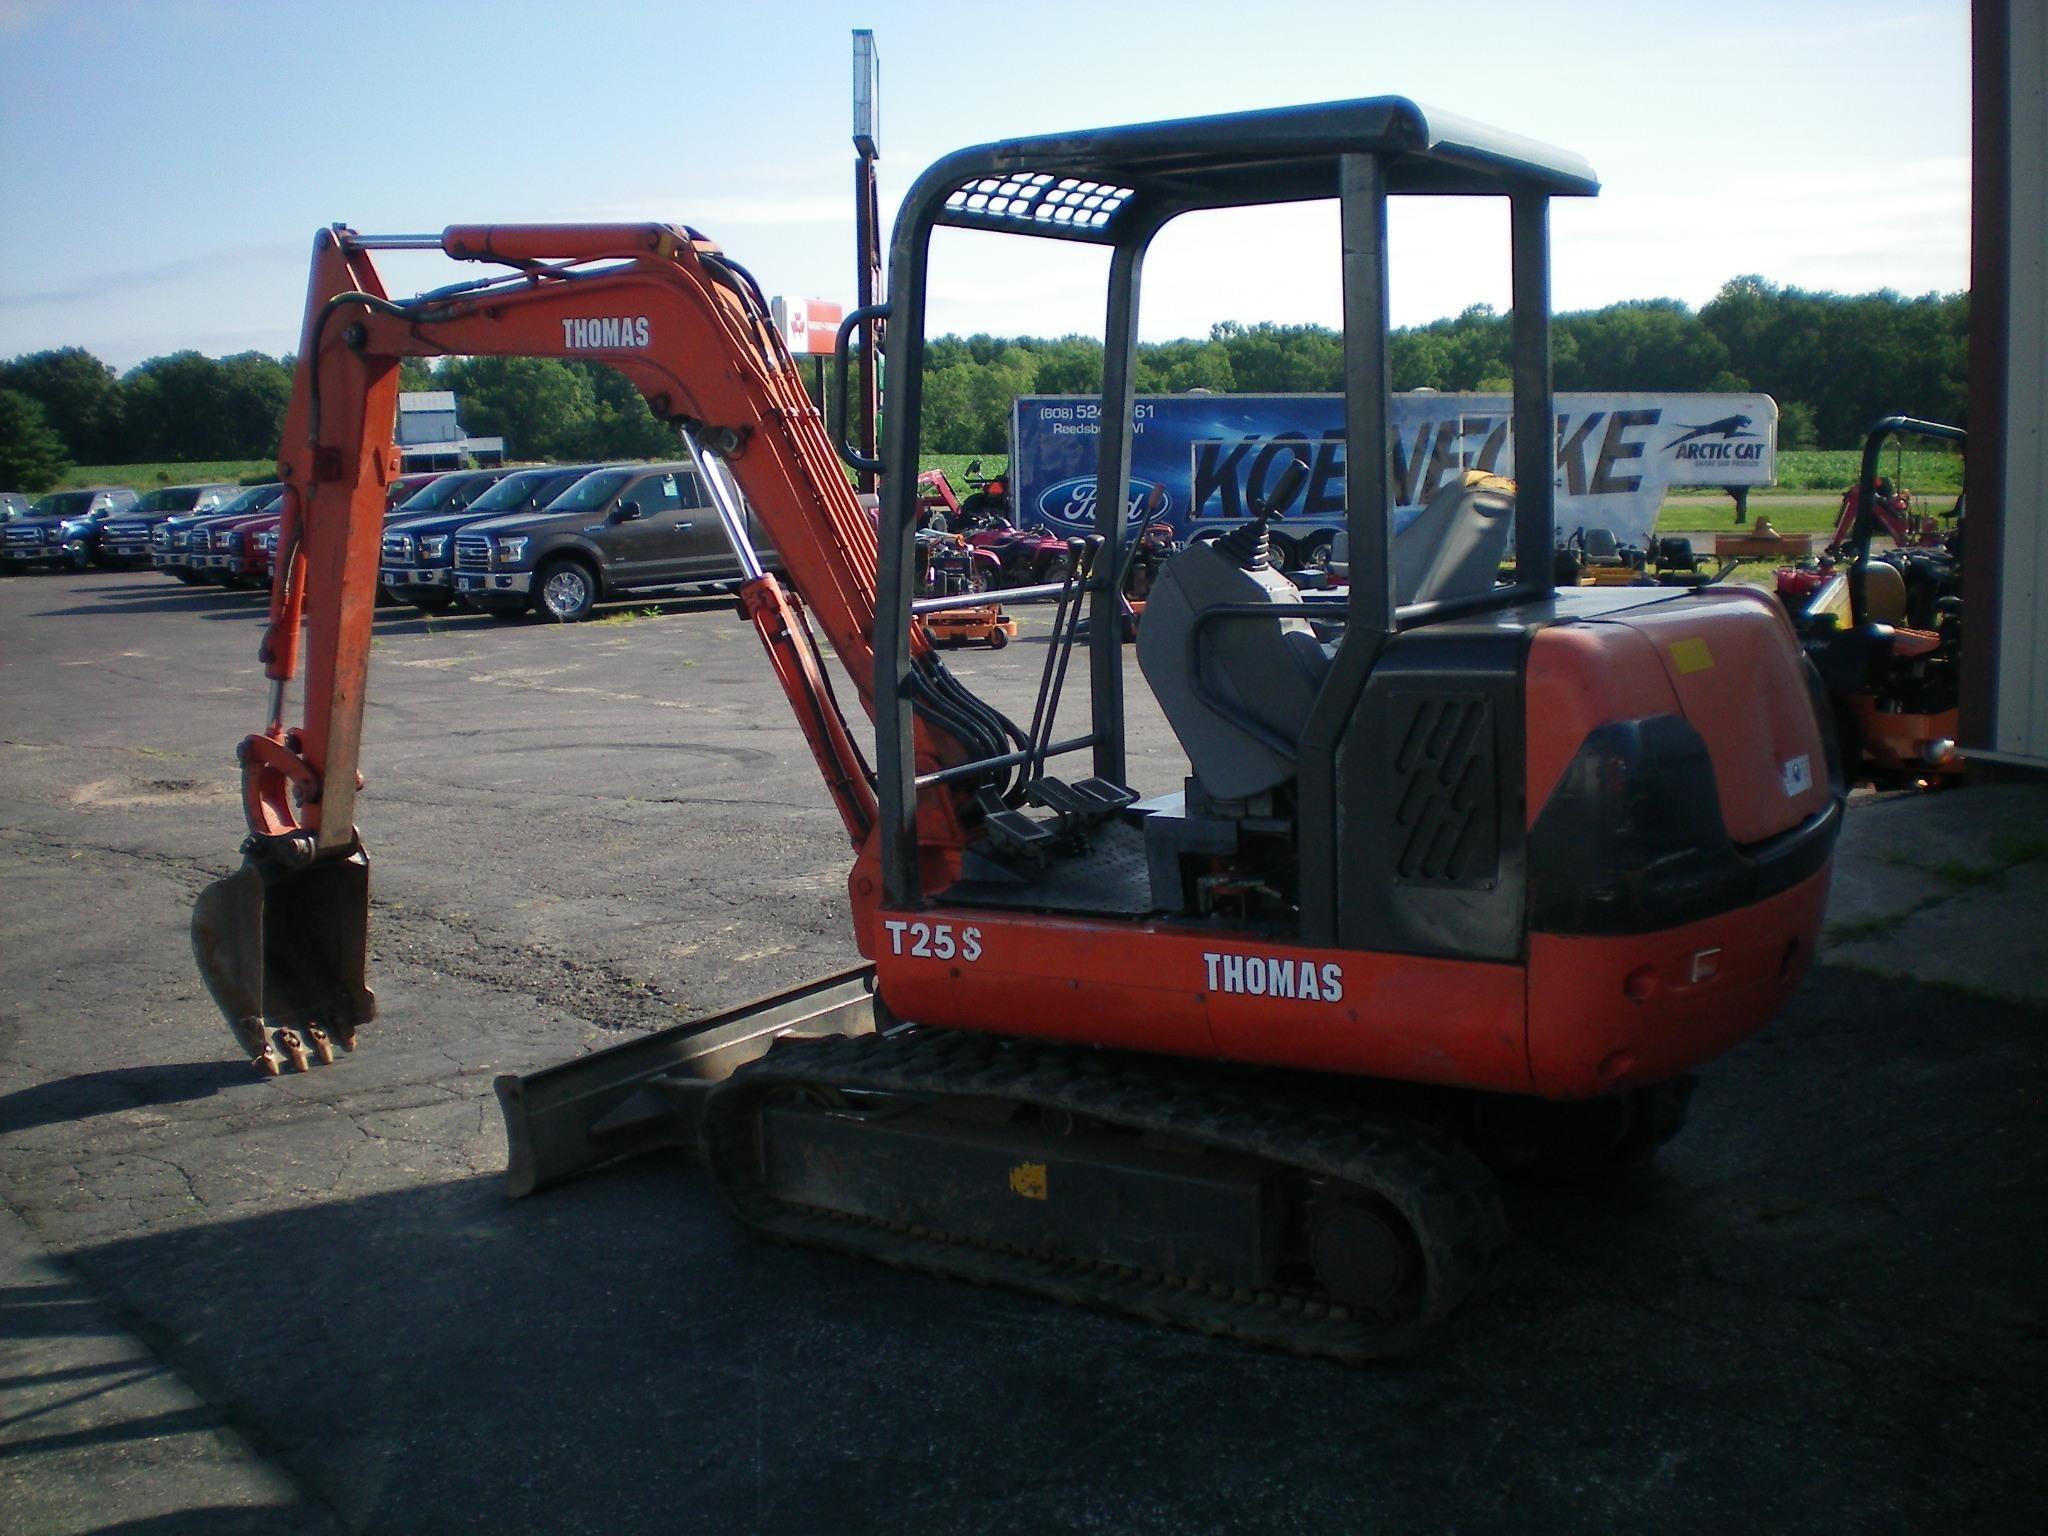 2000 Thomas T25S Excavators and Mini Excavator